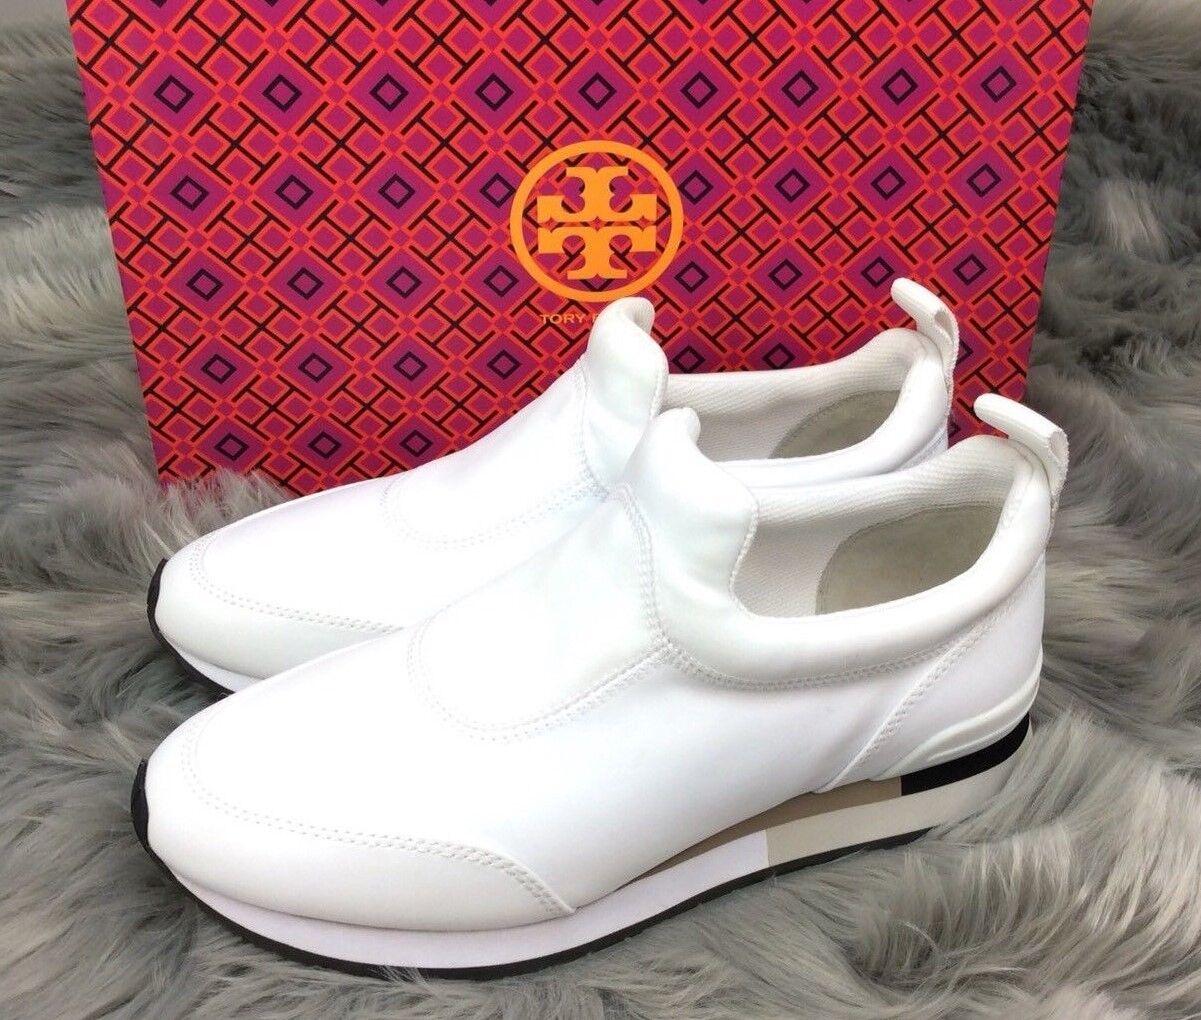 Tory Burch Weiß Laney Runner Platform Wedge Weiß Burch Leder Sneakers Slip On Größe 10 70c143